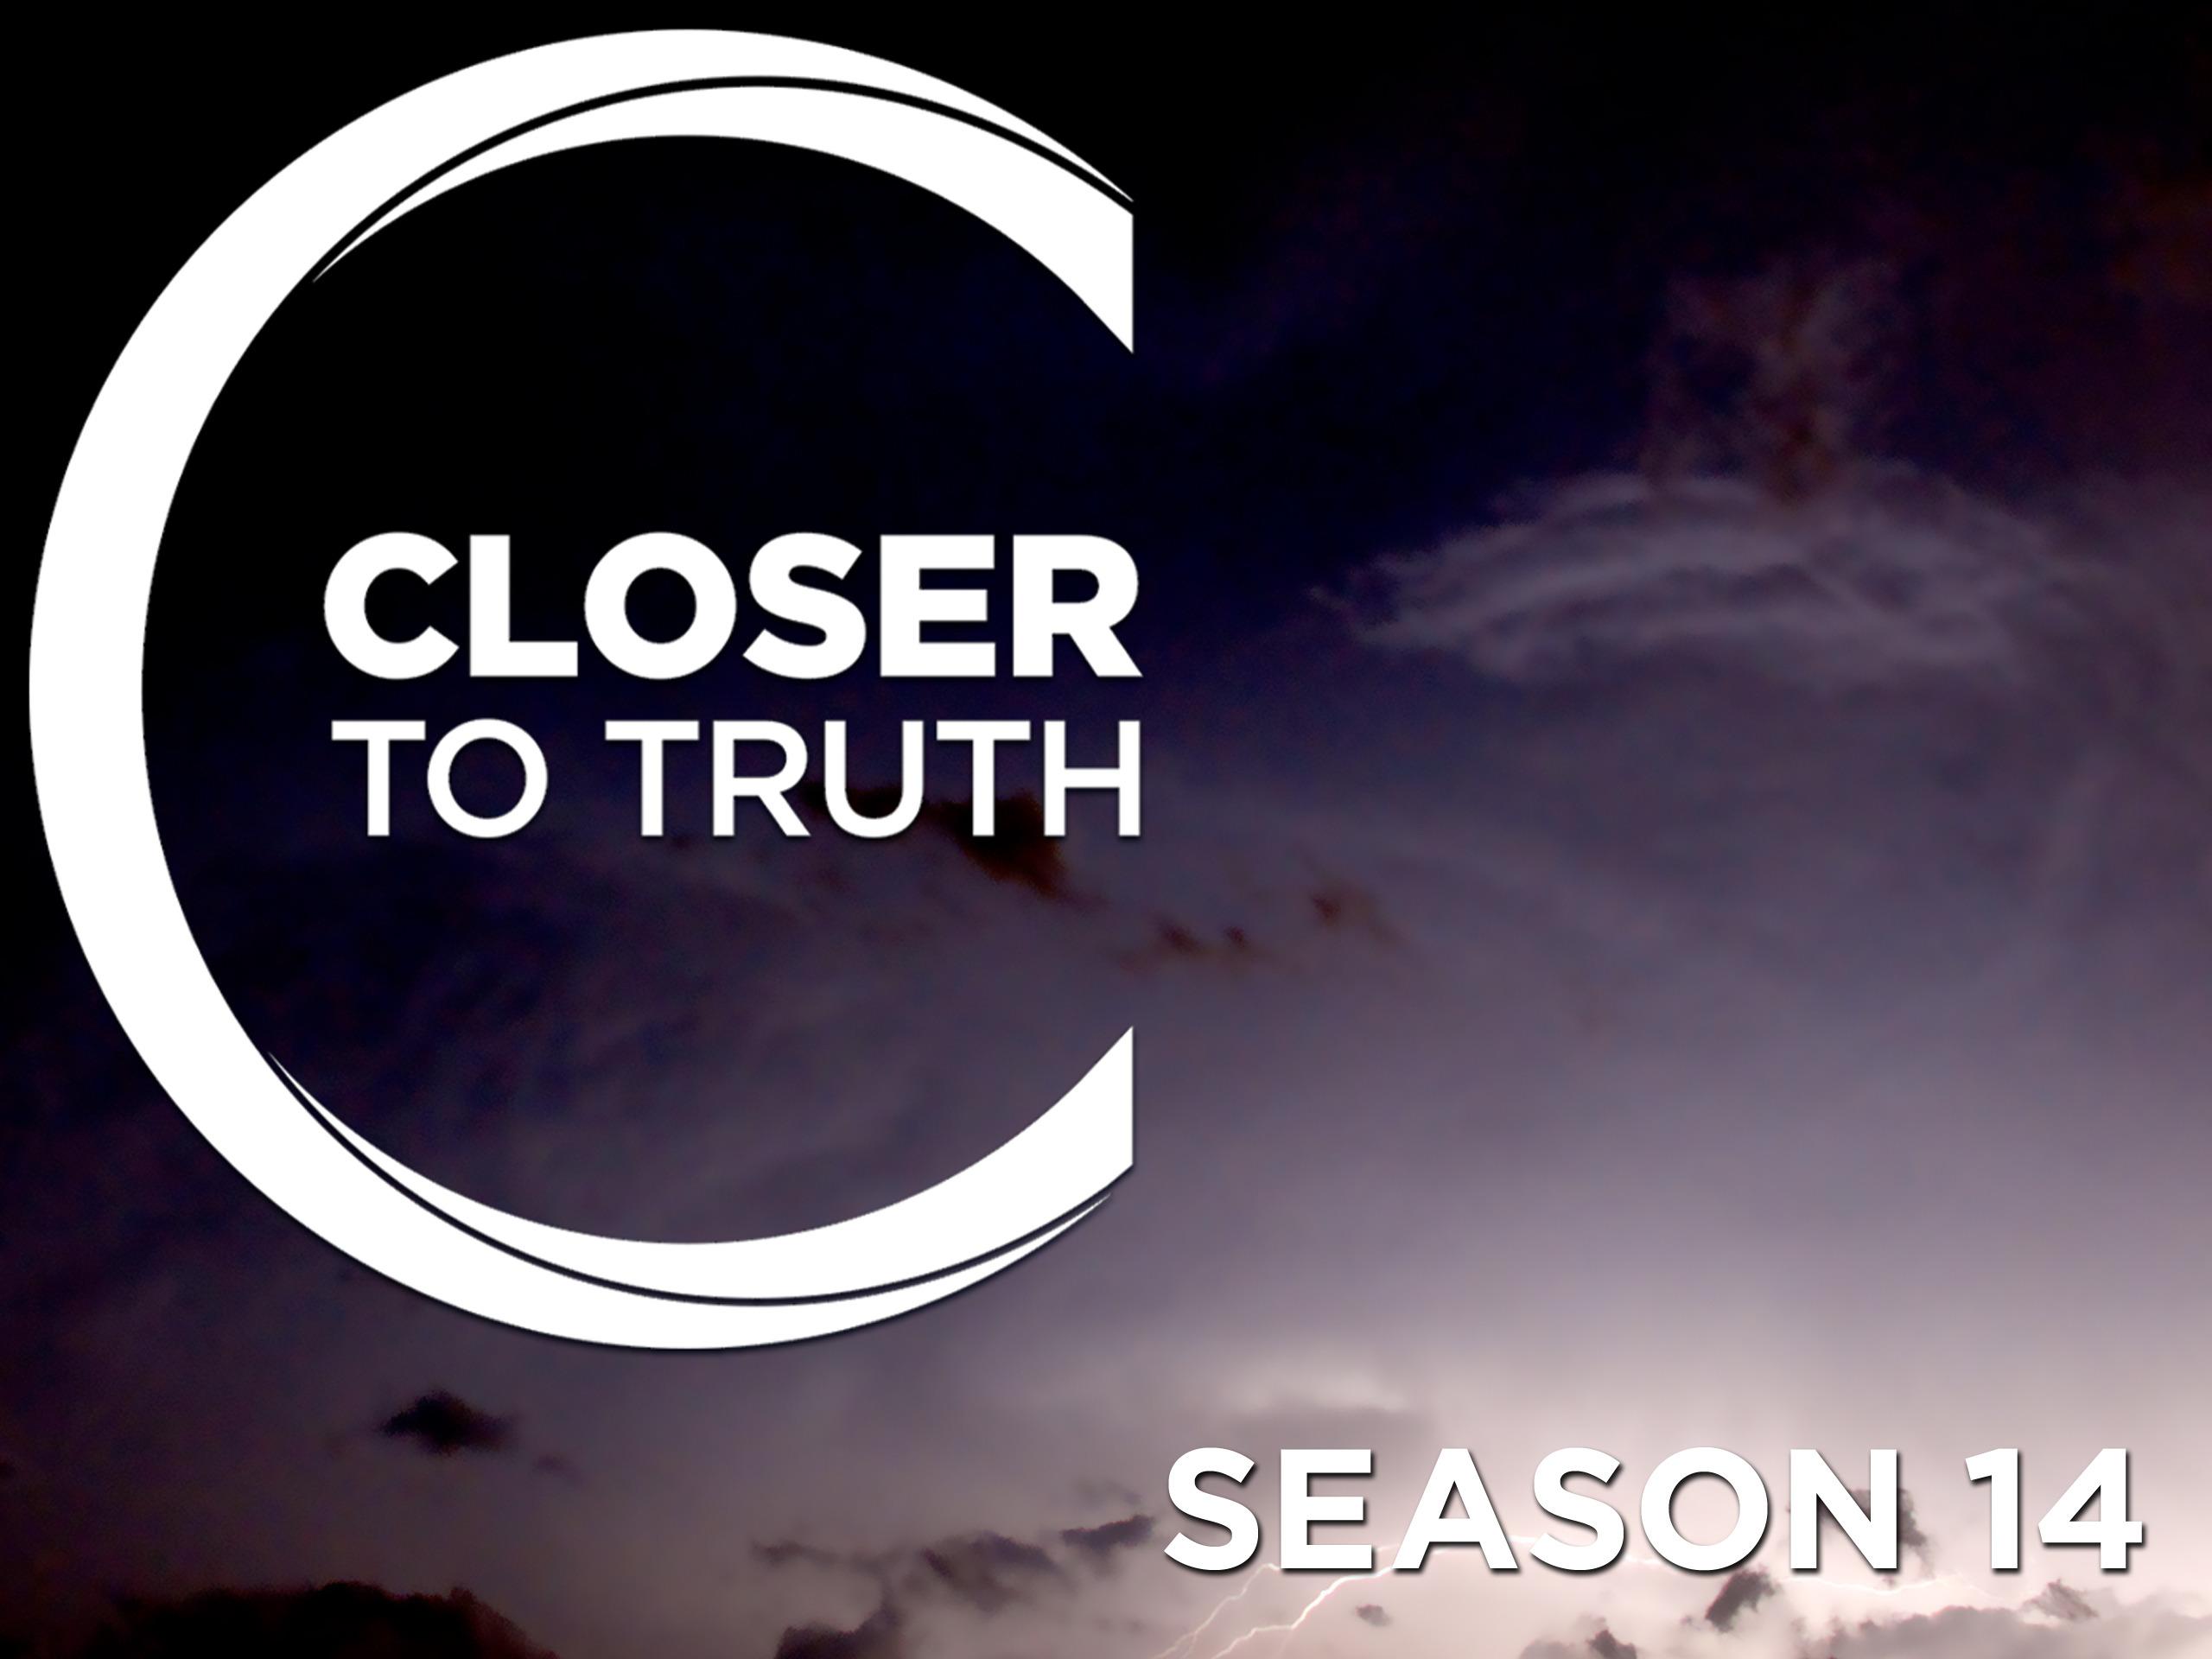 The closer episode guide tv fanatic.